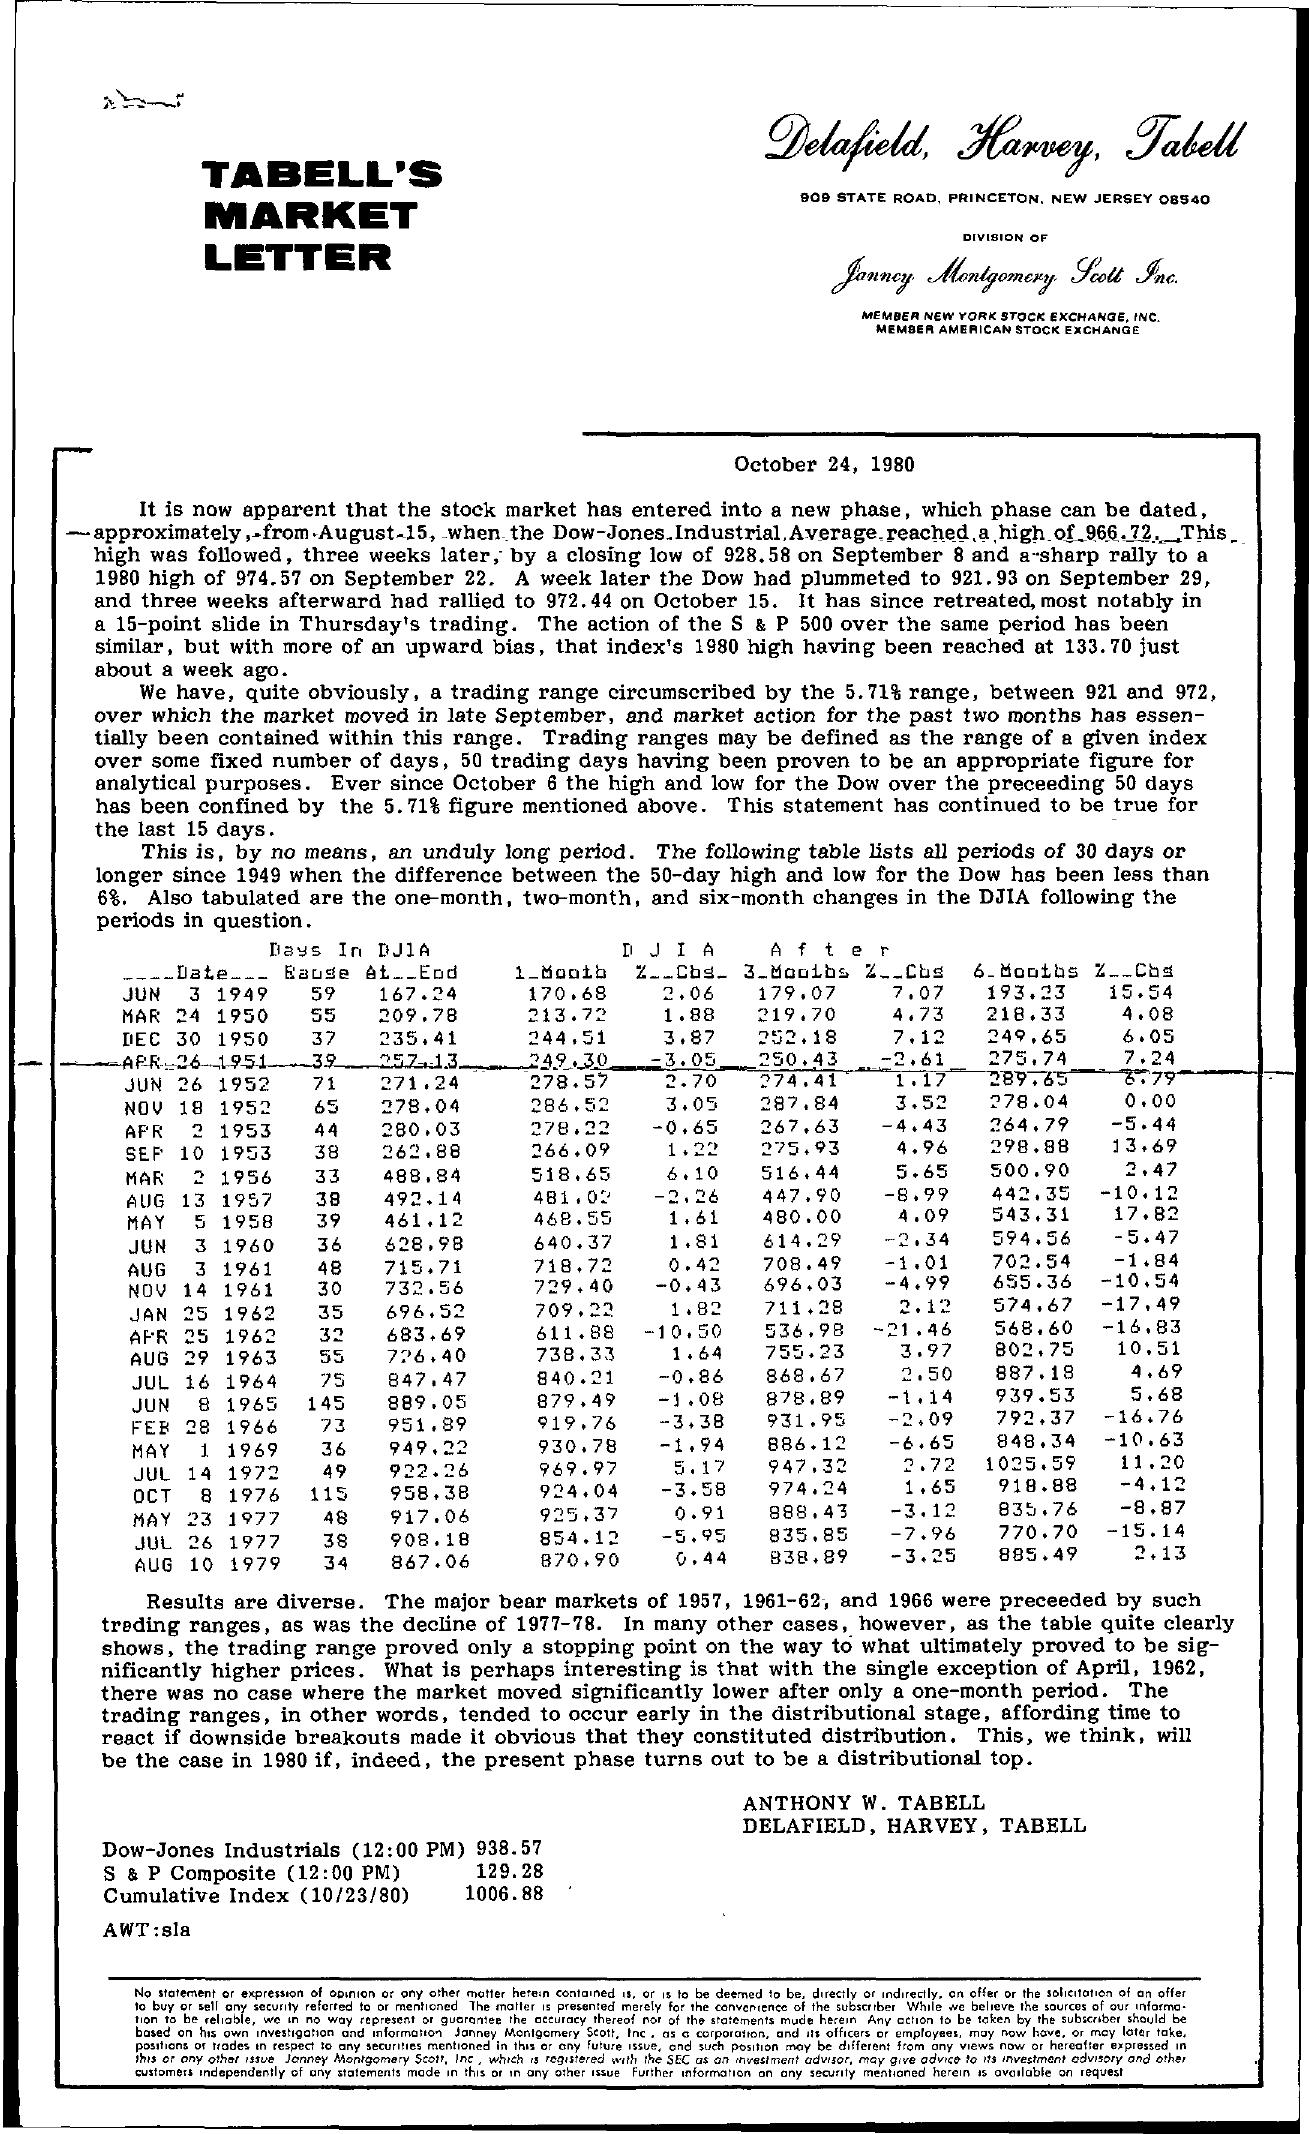 Tabell's Market Letter - October 24, 1980